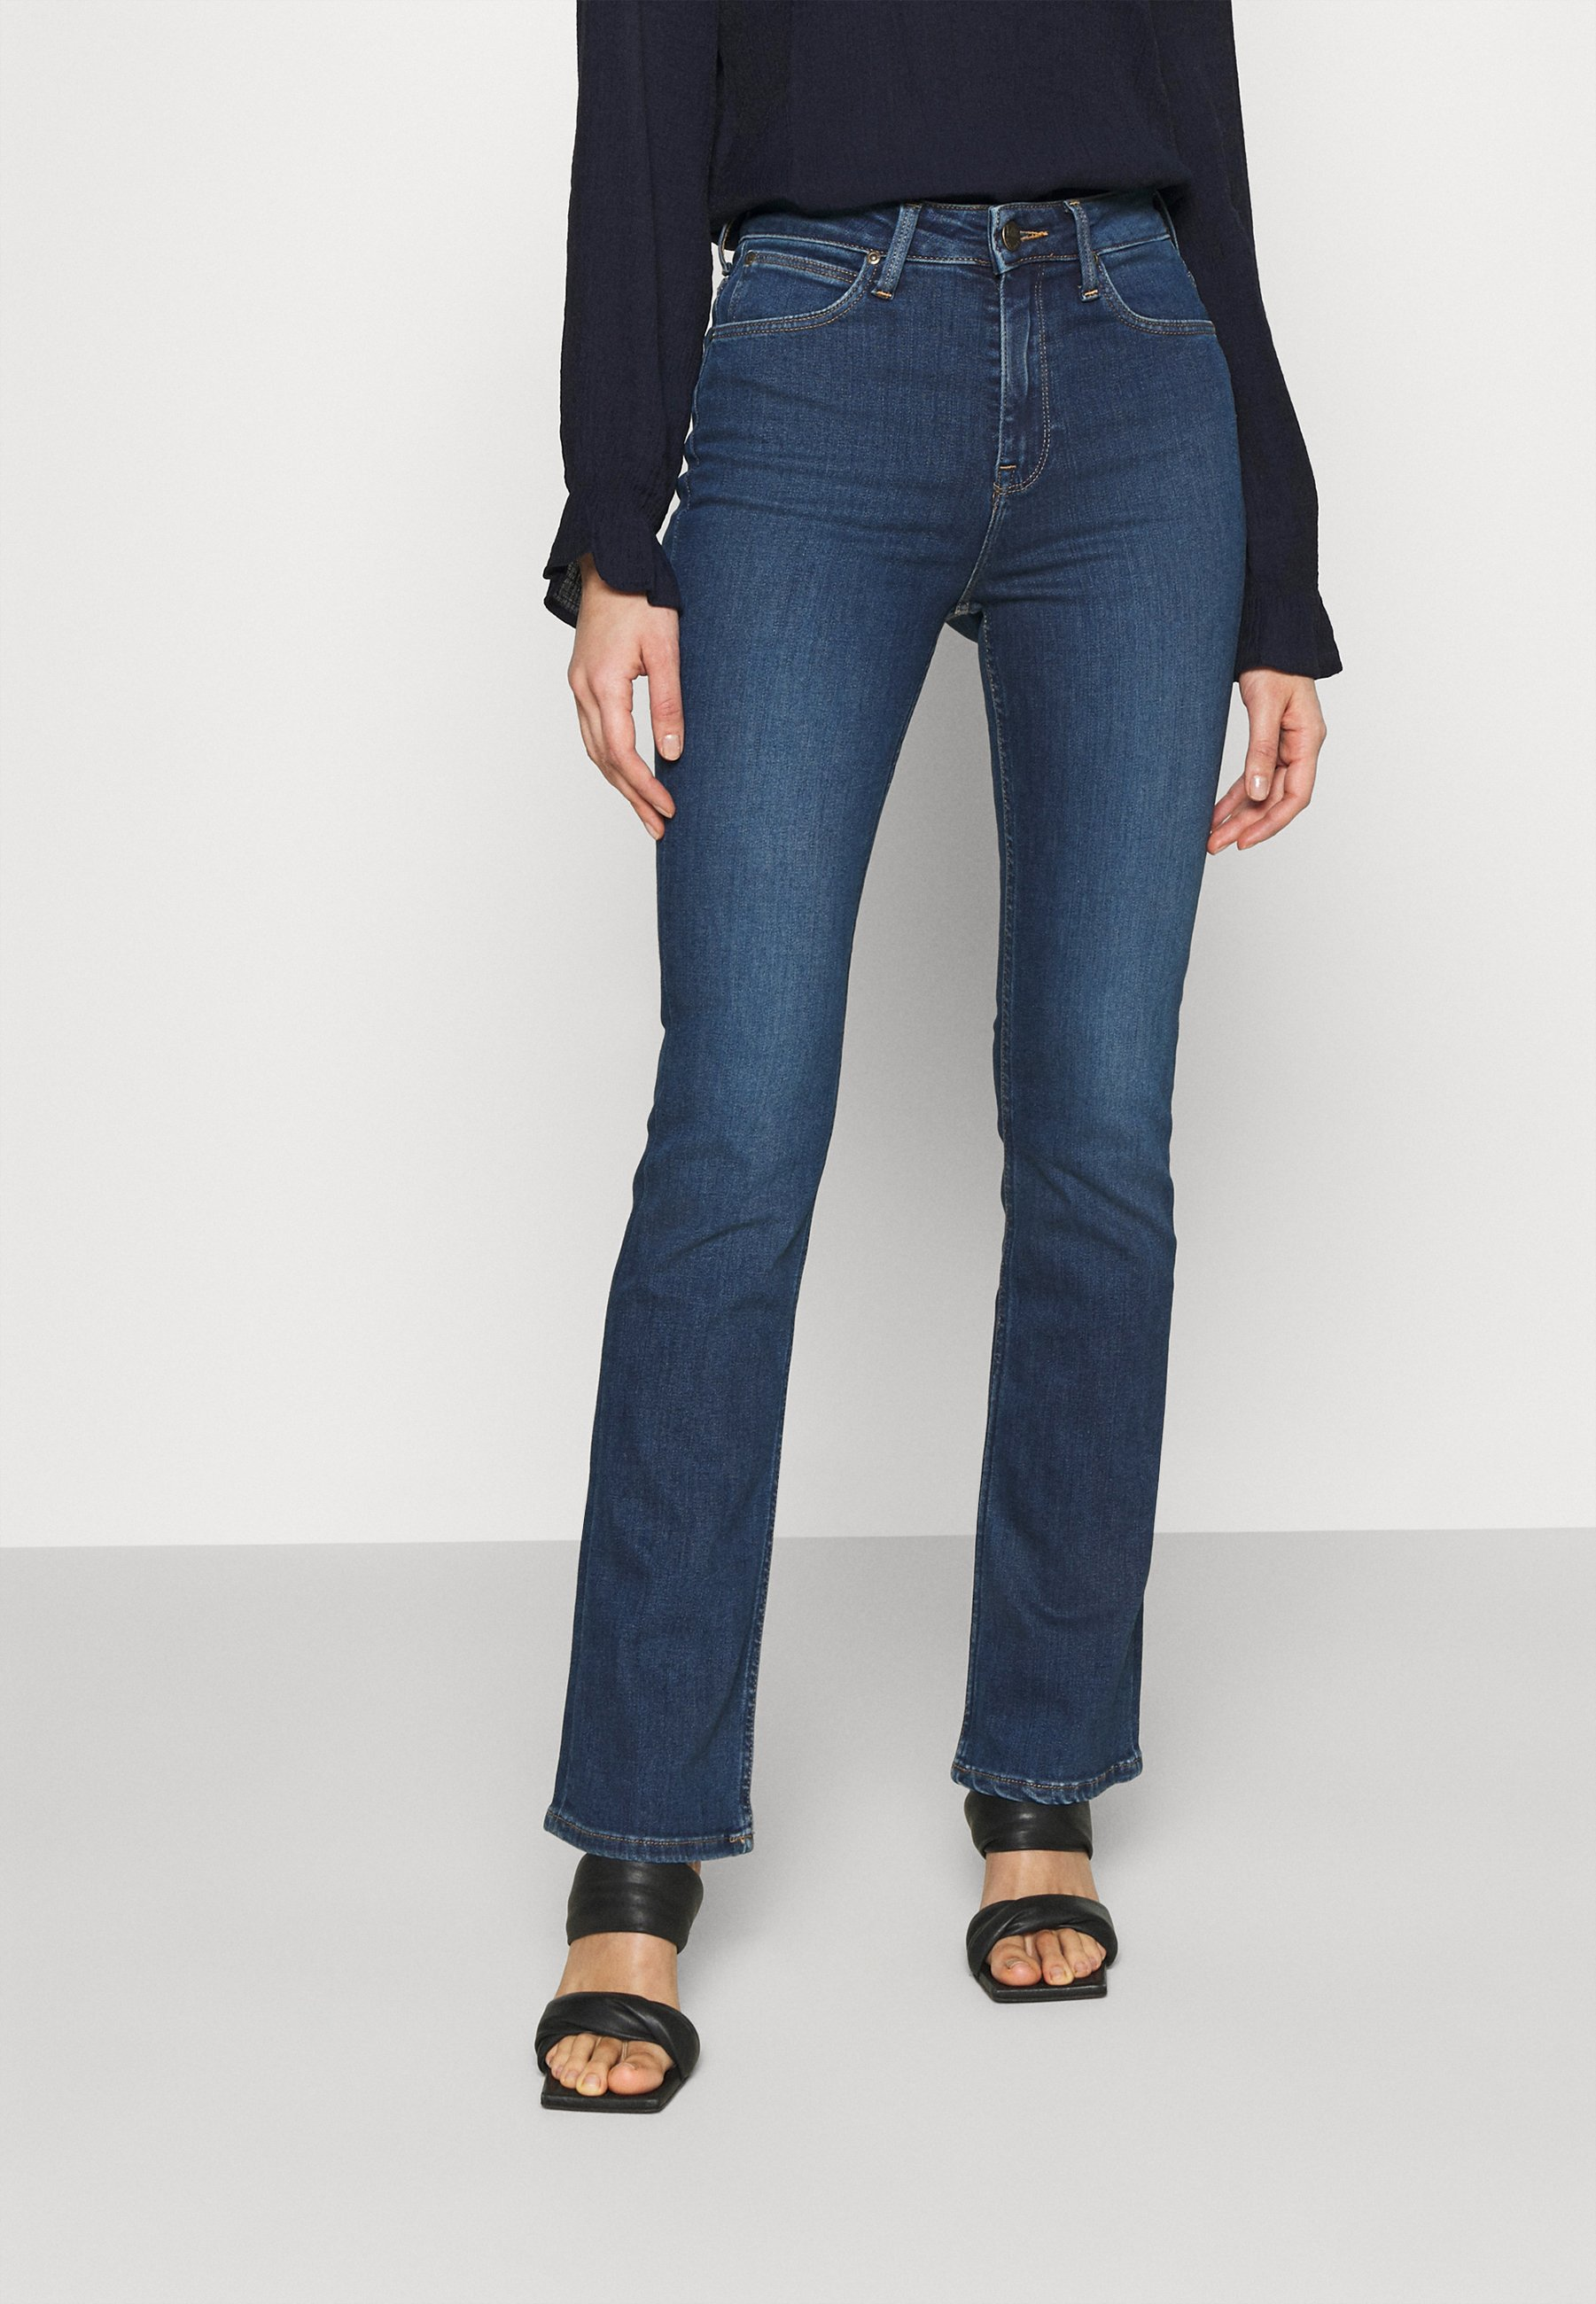 Femme BREESE - Jean bootcut